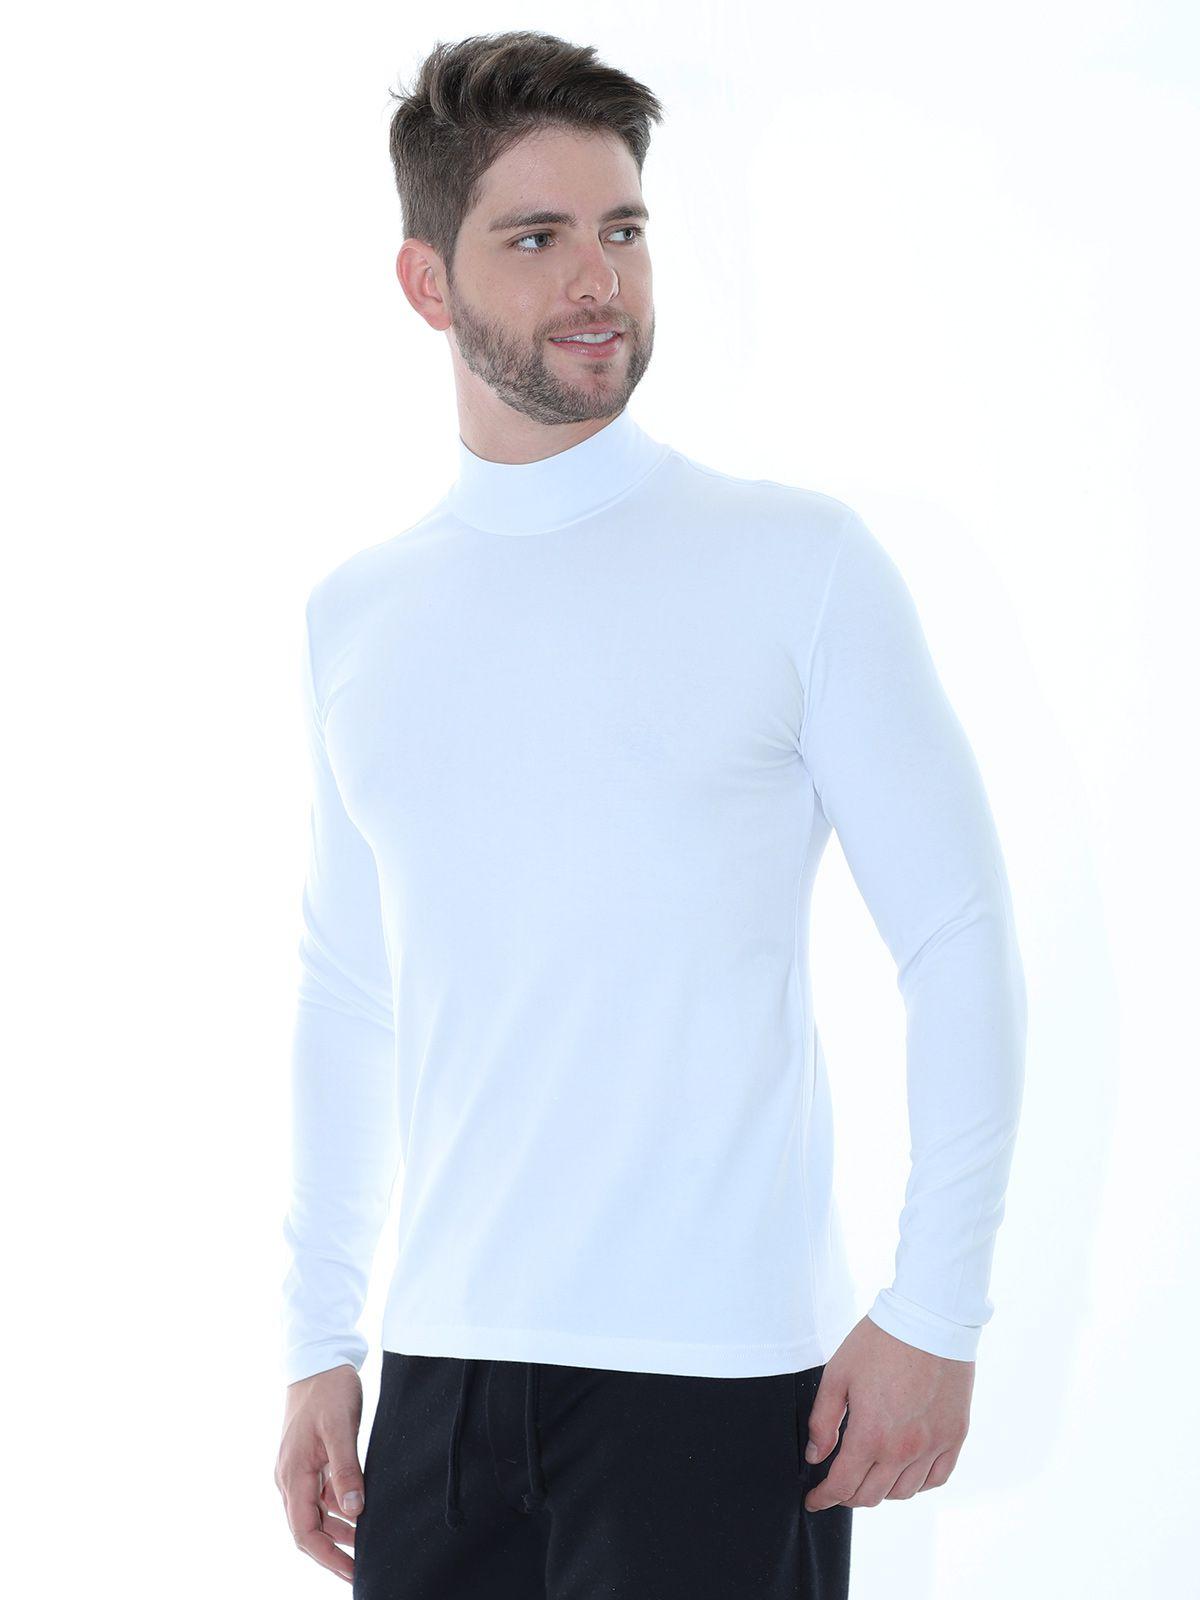 Blusa Masculina Anistia Gola Alta Slim com Elastano Branca